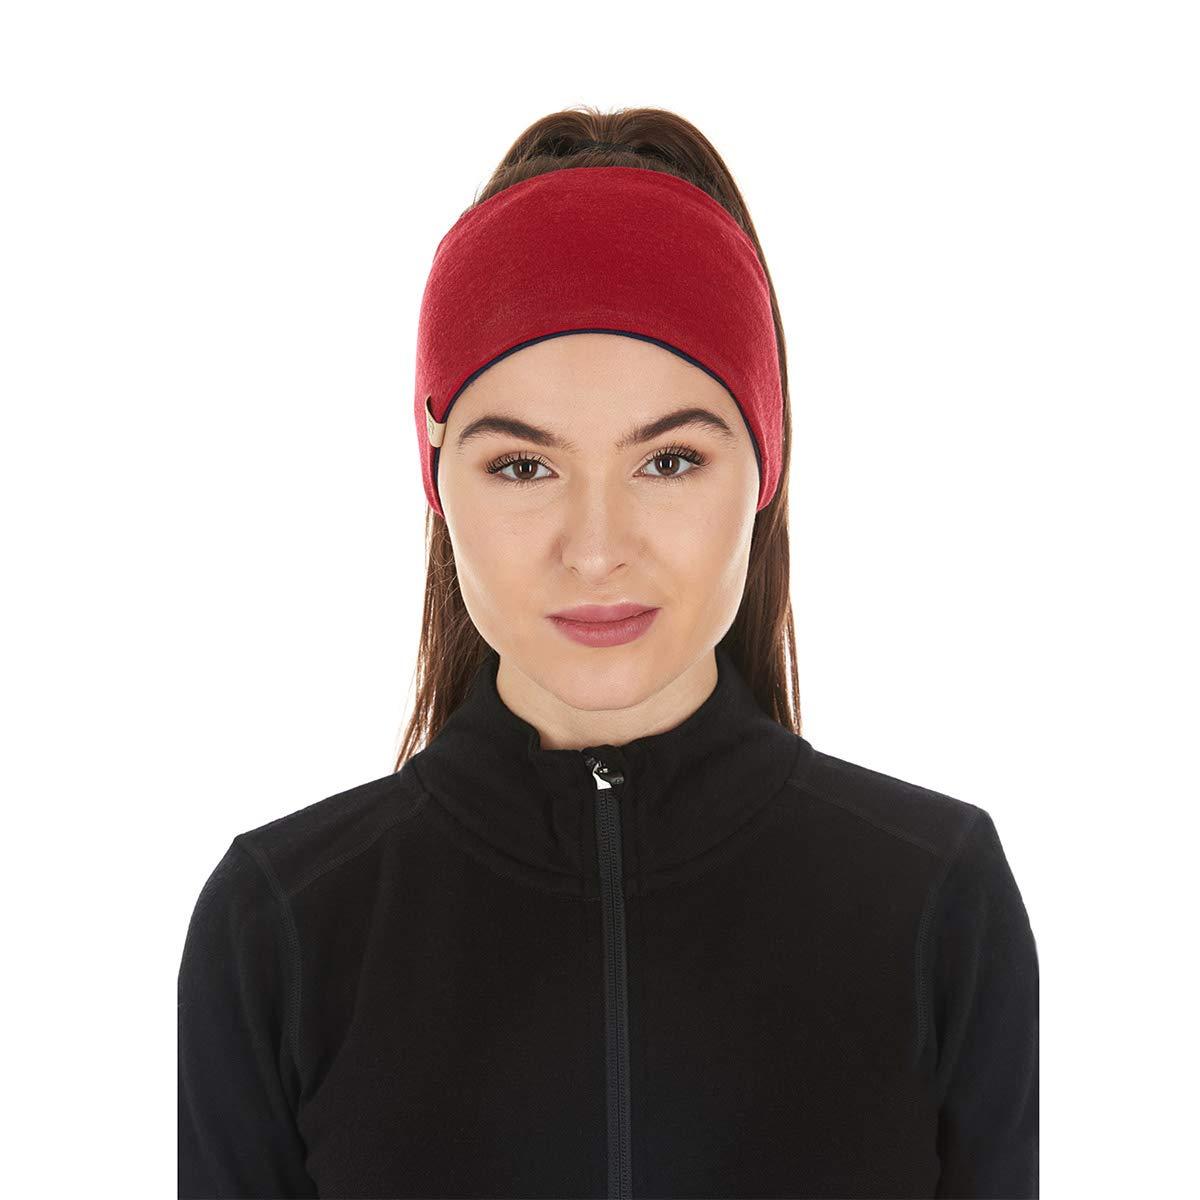 Minus33 Merino Wool Clothing Unisex Midweight Wool Reversible Headband, True Red-Black, One Size